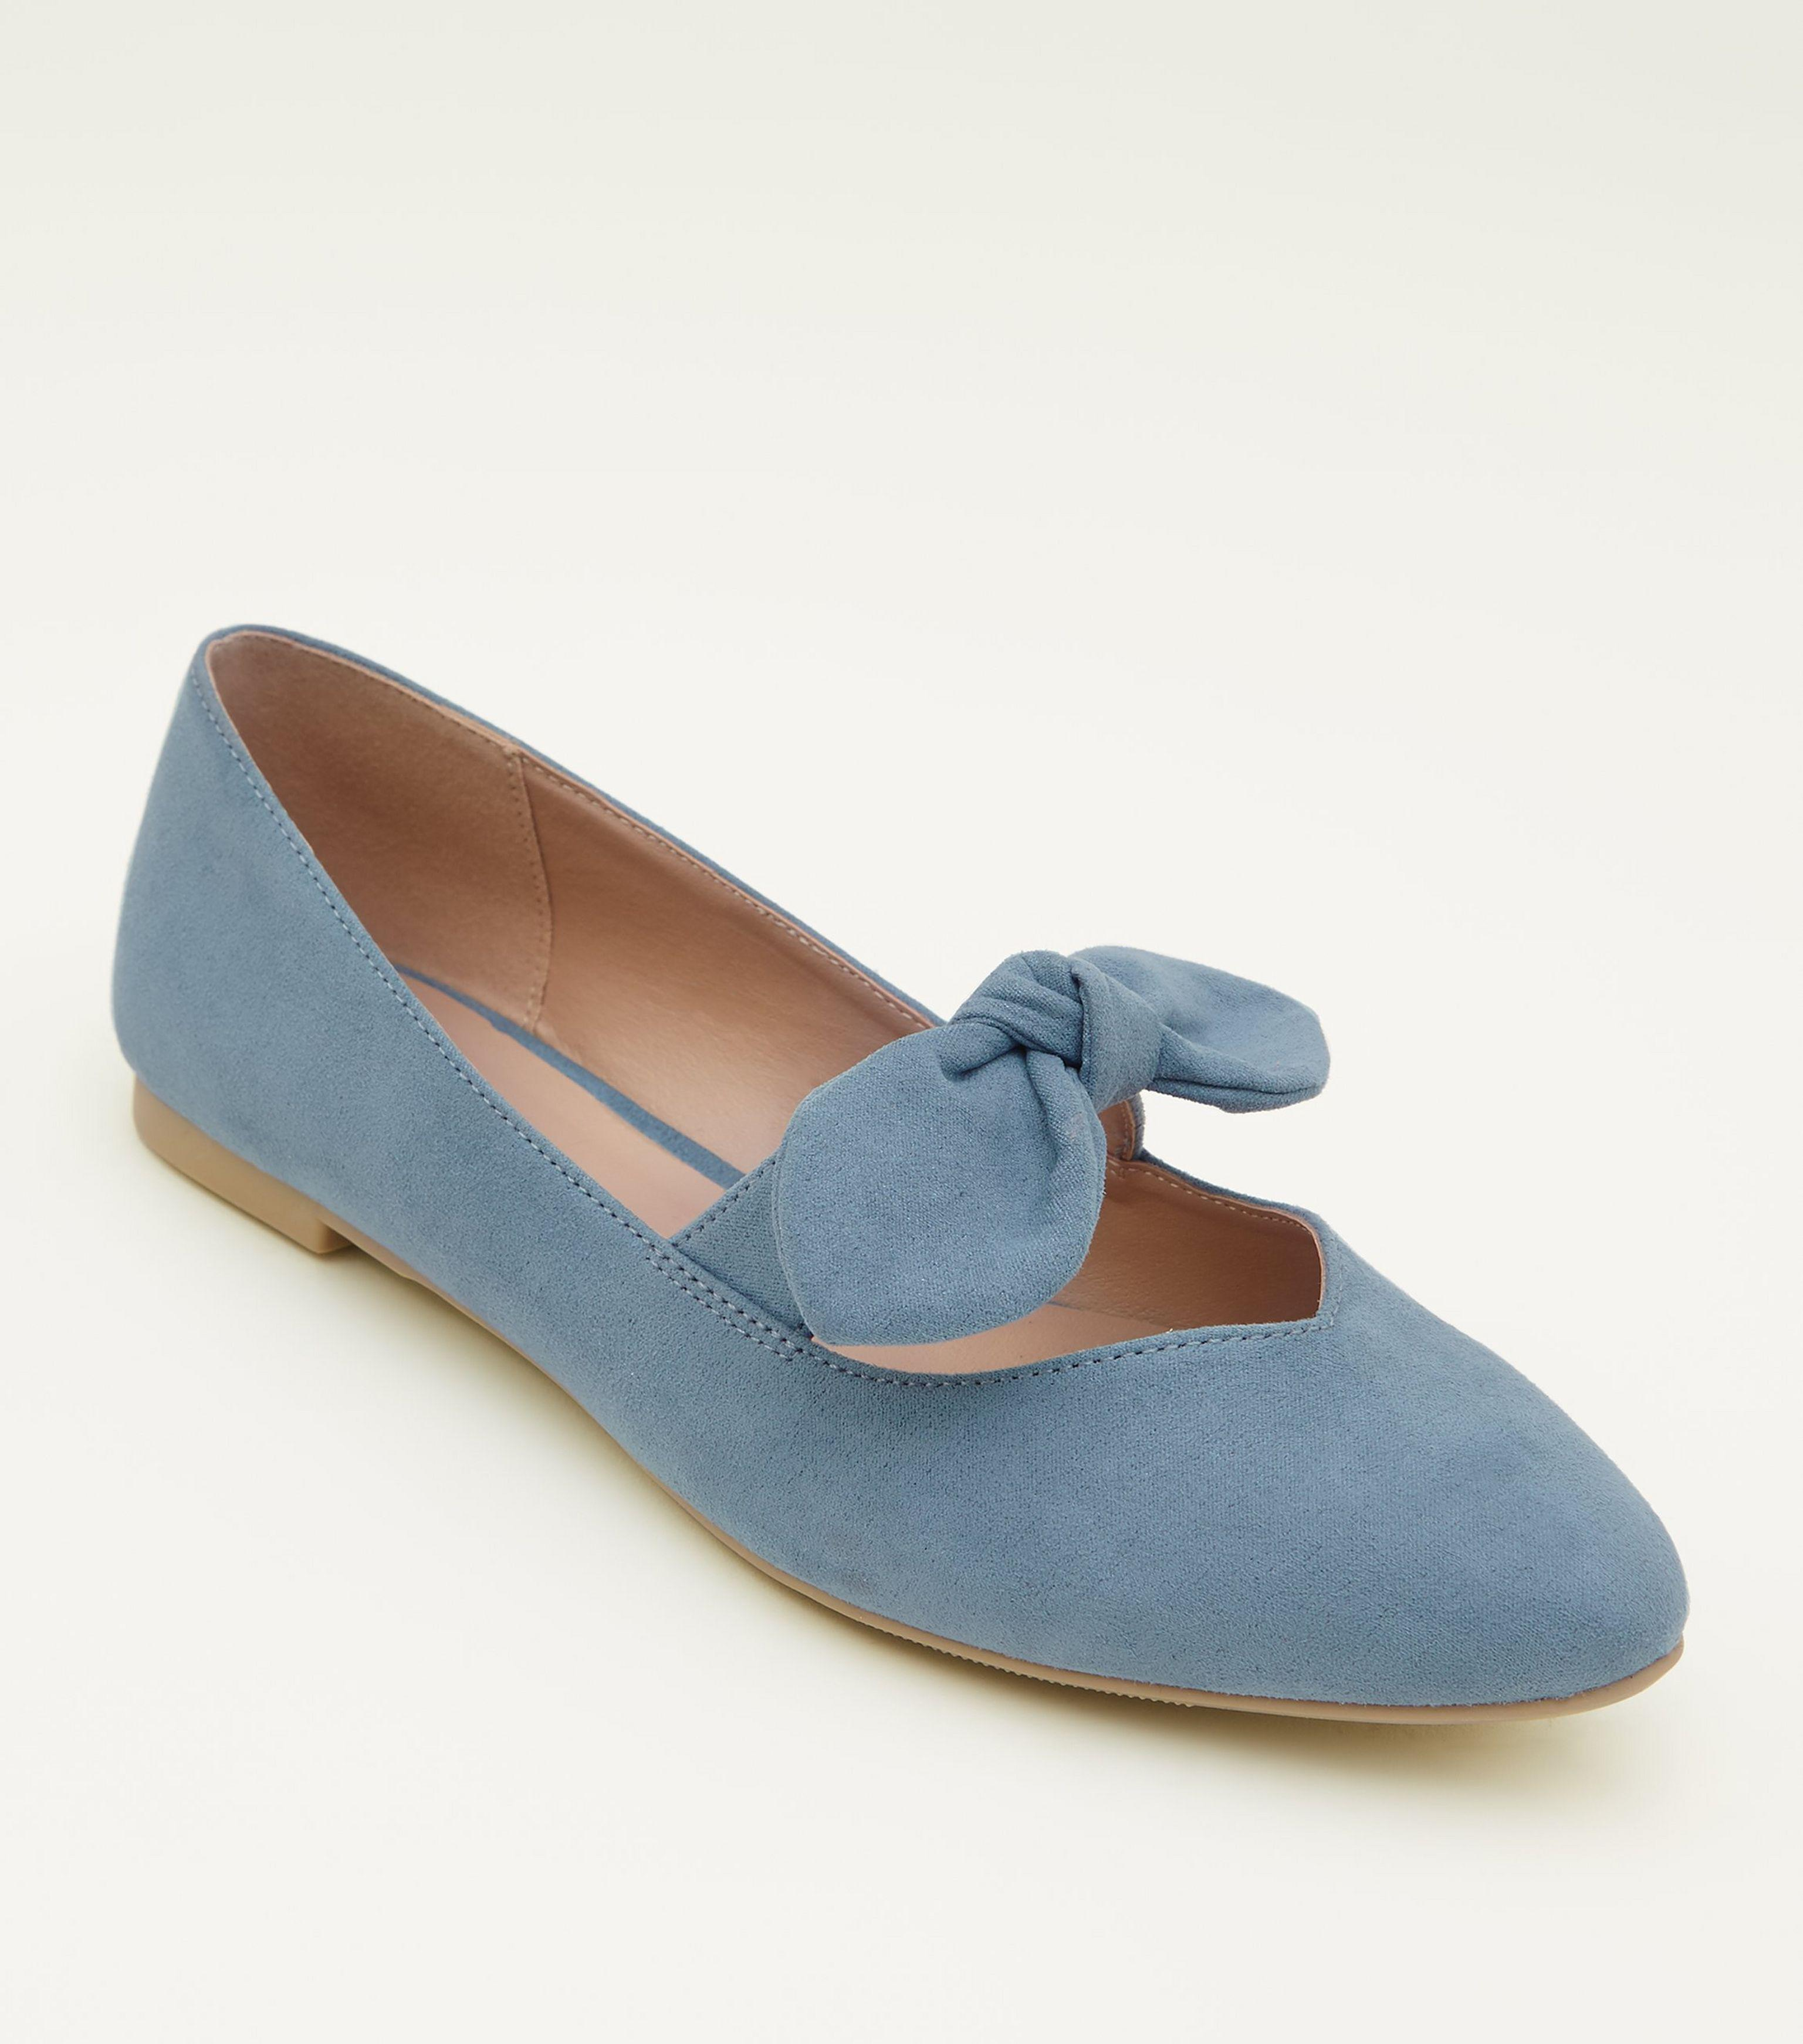 f3e74d6a47e New Look Girls Blue Suedette Bow Front Ballet Pumps in Blue - Lyst